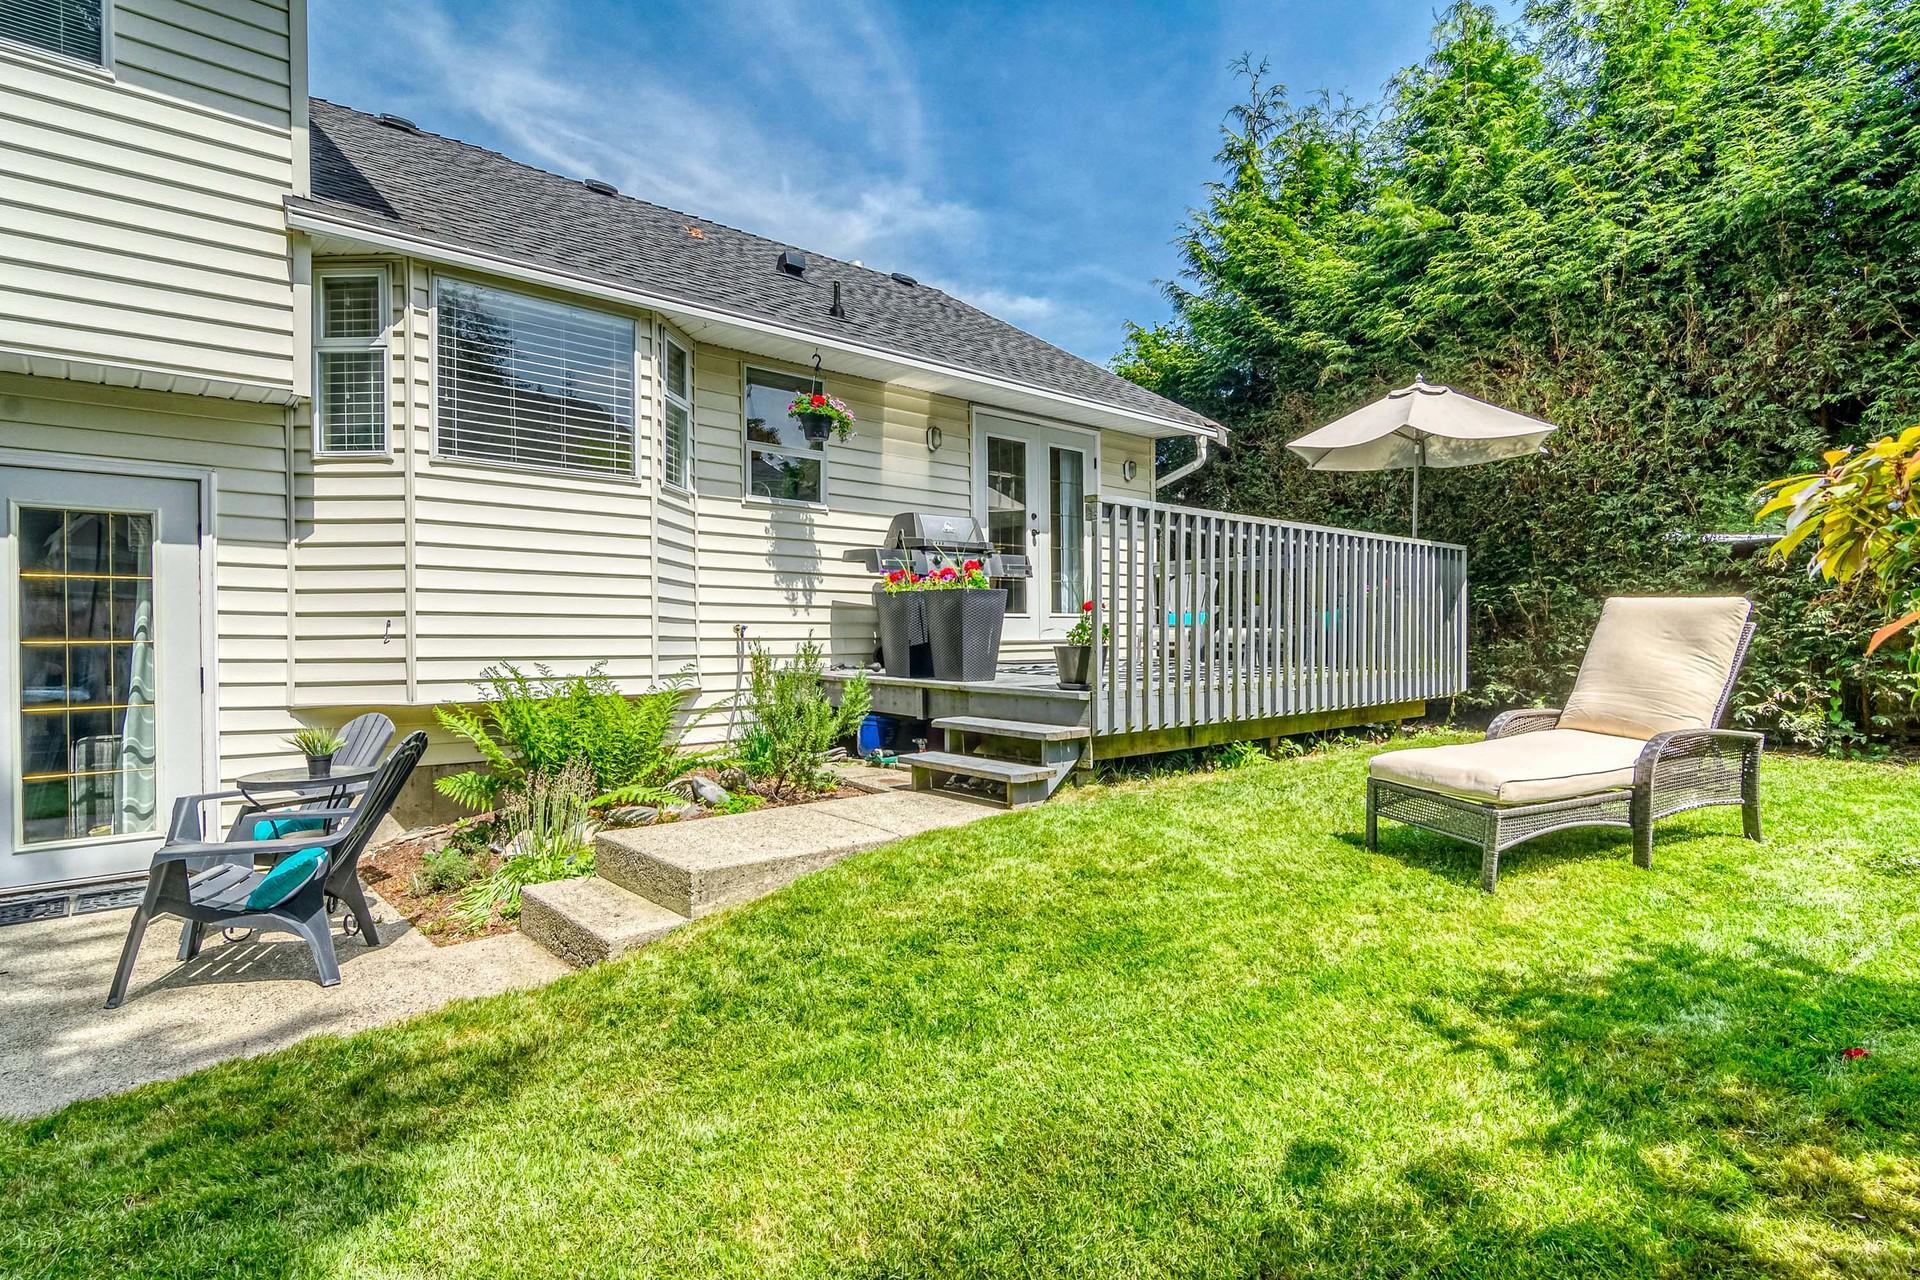 41087_28 at 2421 127 Street, Crescent Bch Ocean Pk., South Surrey White Rock